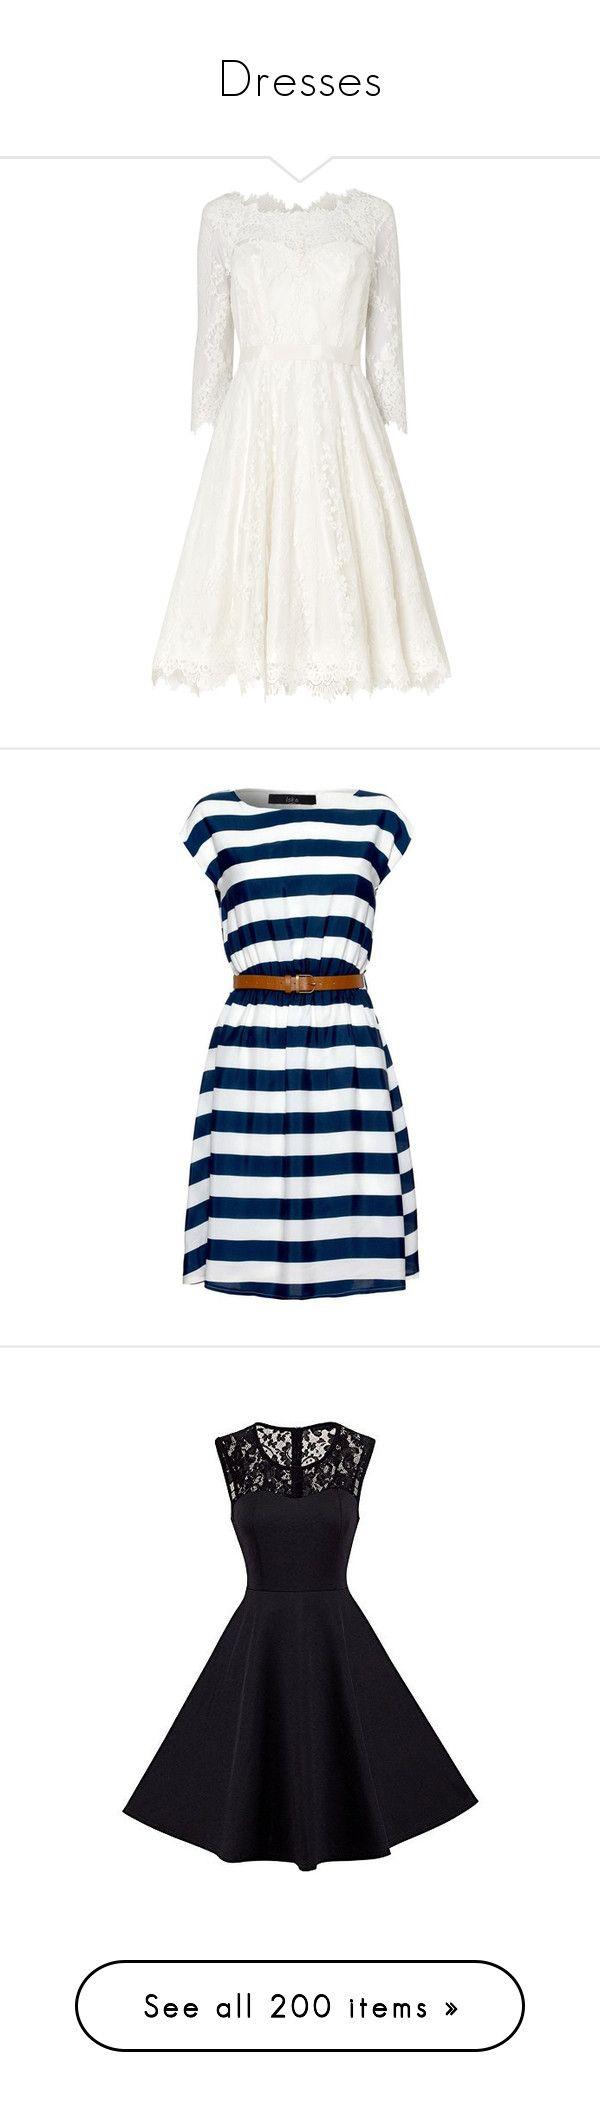 """Dresses"" by natia-sstyle ❤ liked on Polyvore featuring dresses, wedding dresses, wedding, wedding dress, robe, short dresses, vestidos, women's dresses & skirts, blue mini dress and navy mini dress"